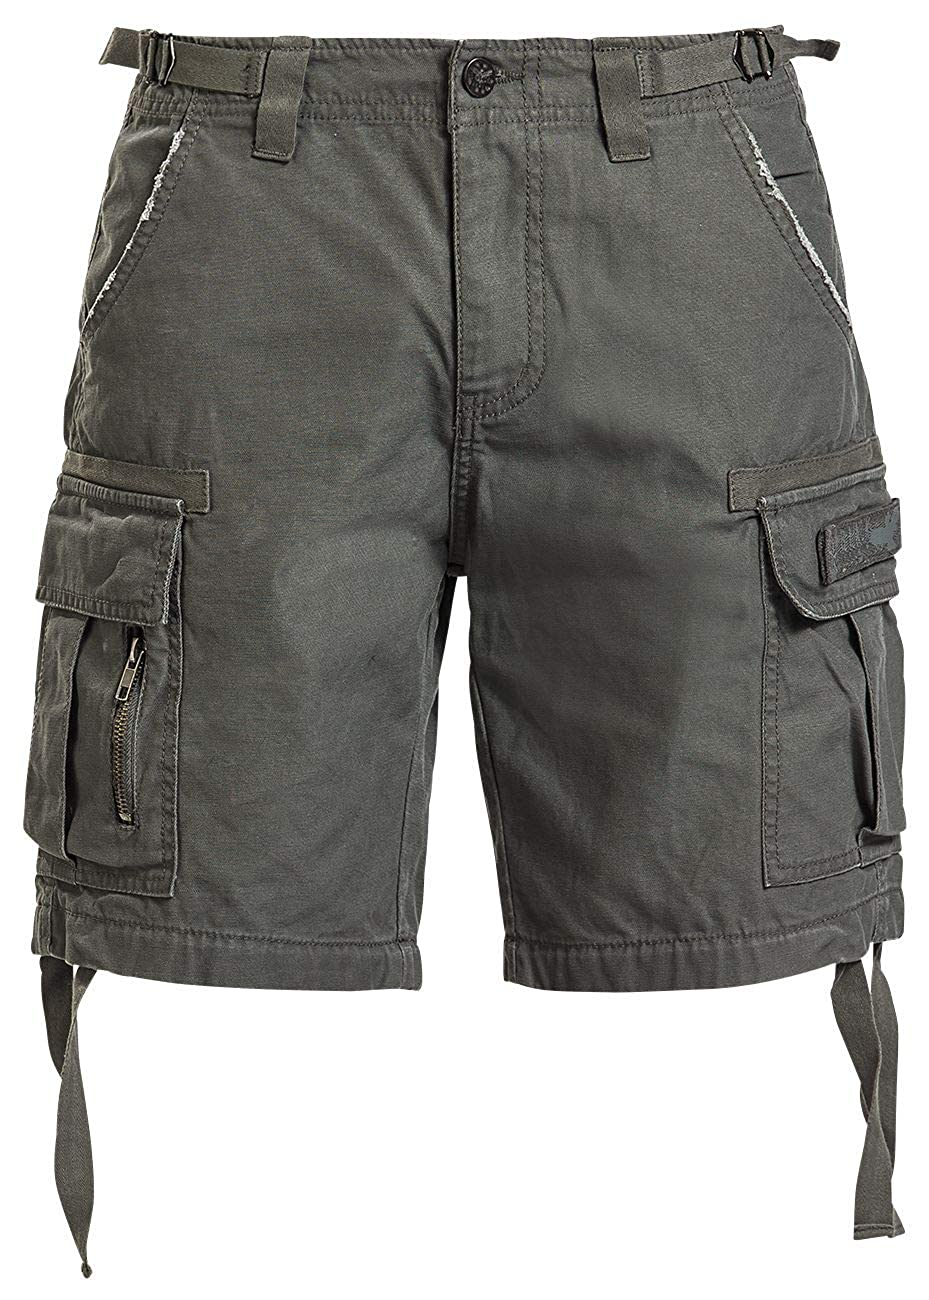 schwarz Premium by EMP Army Vintage Shorts Short schwarz B06Y4ZWZ27 Shorts Stimmt